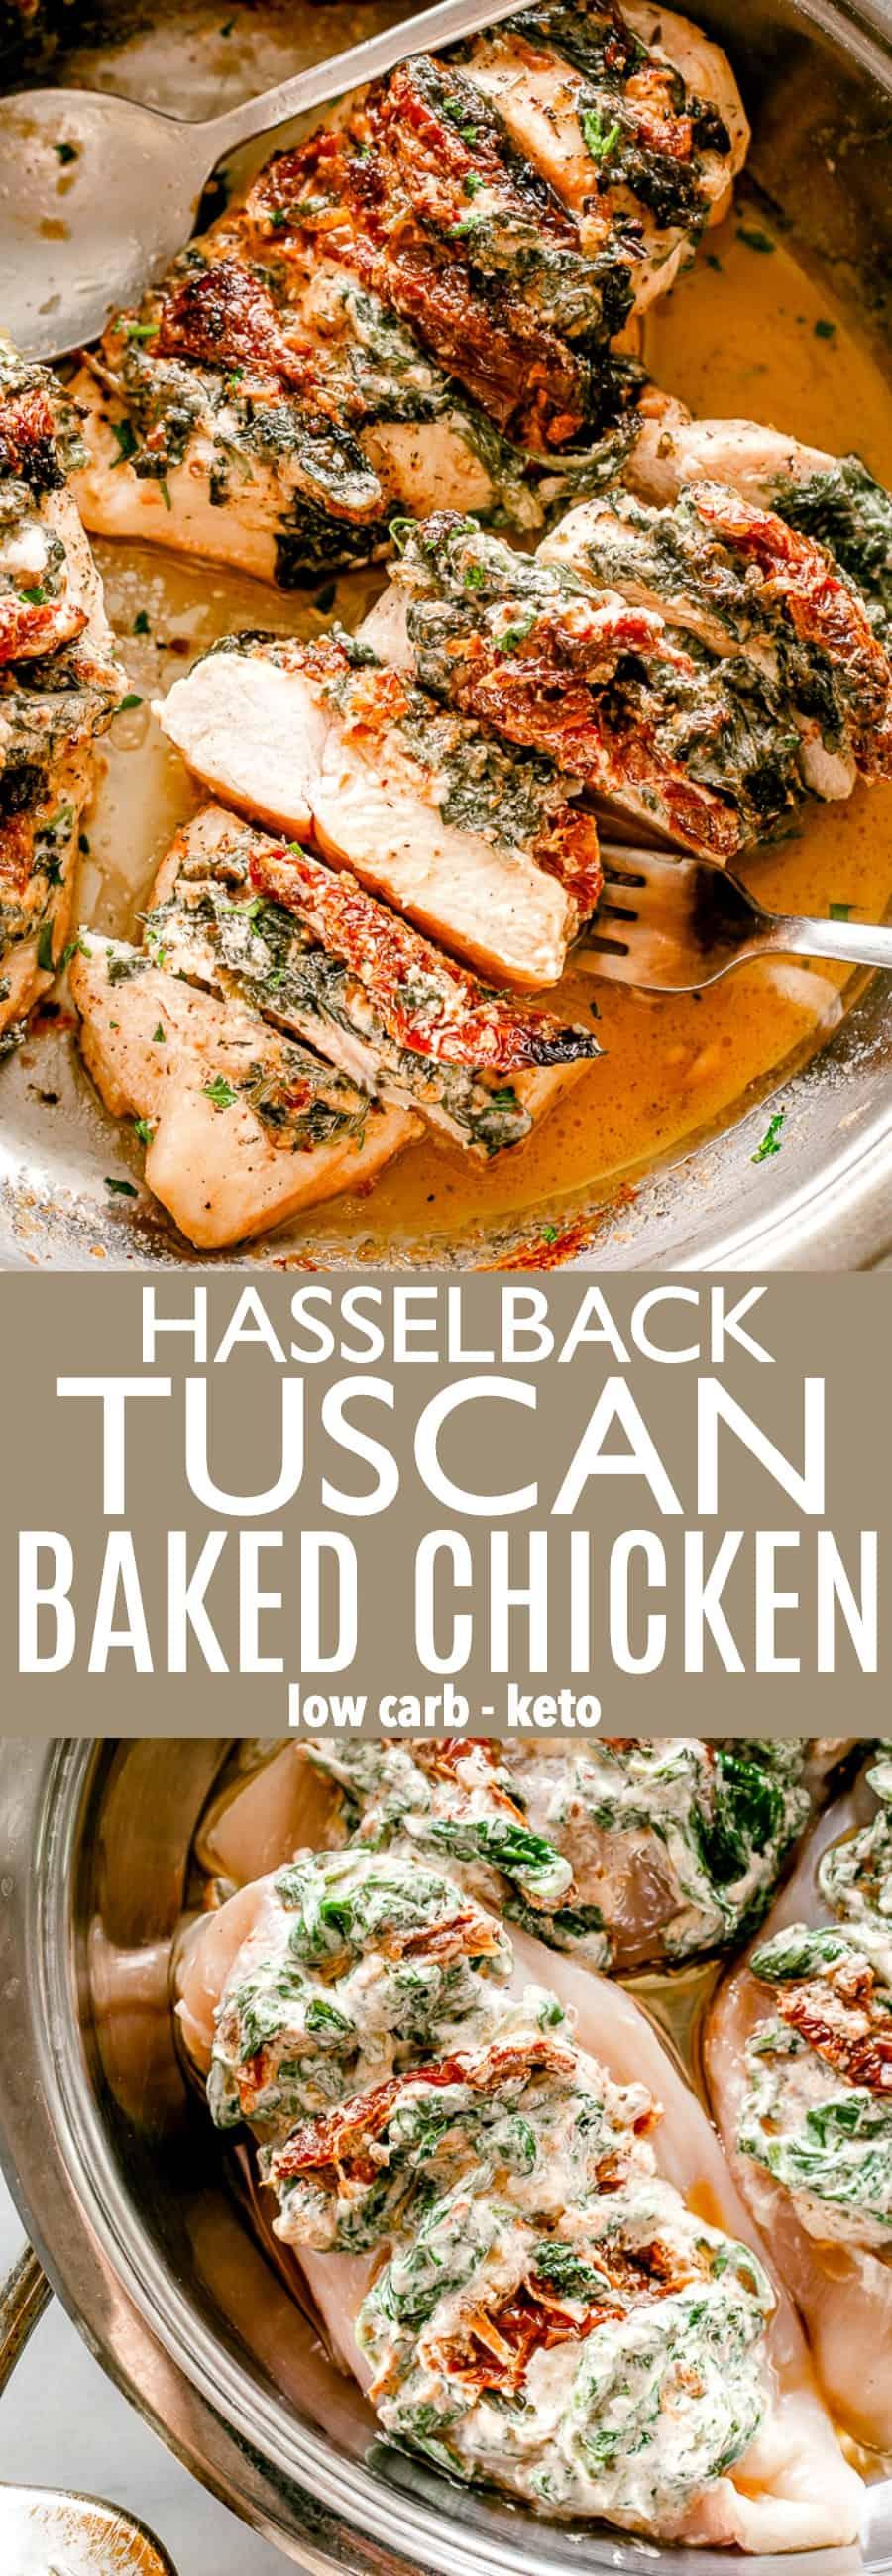 Tuscan Baked Chicken Pin Image